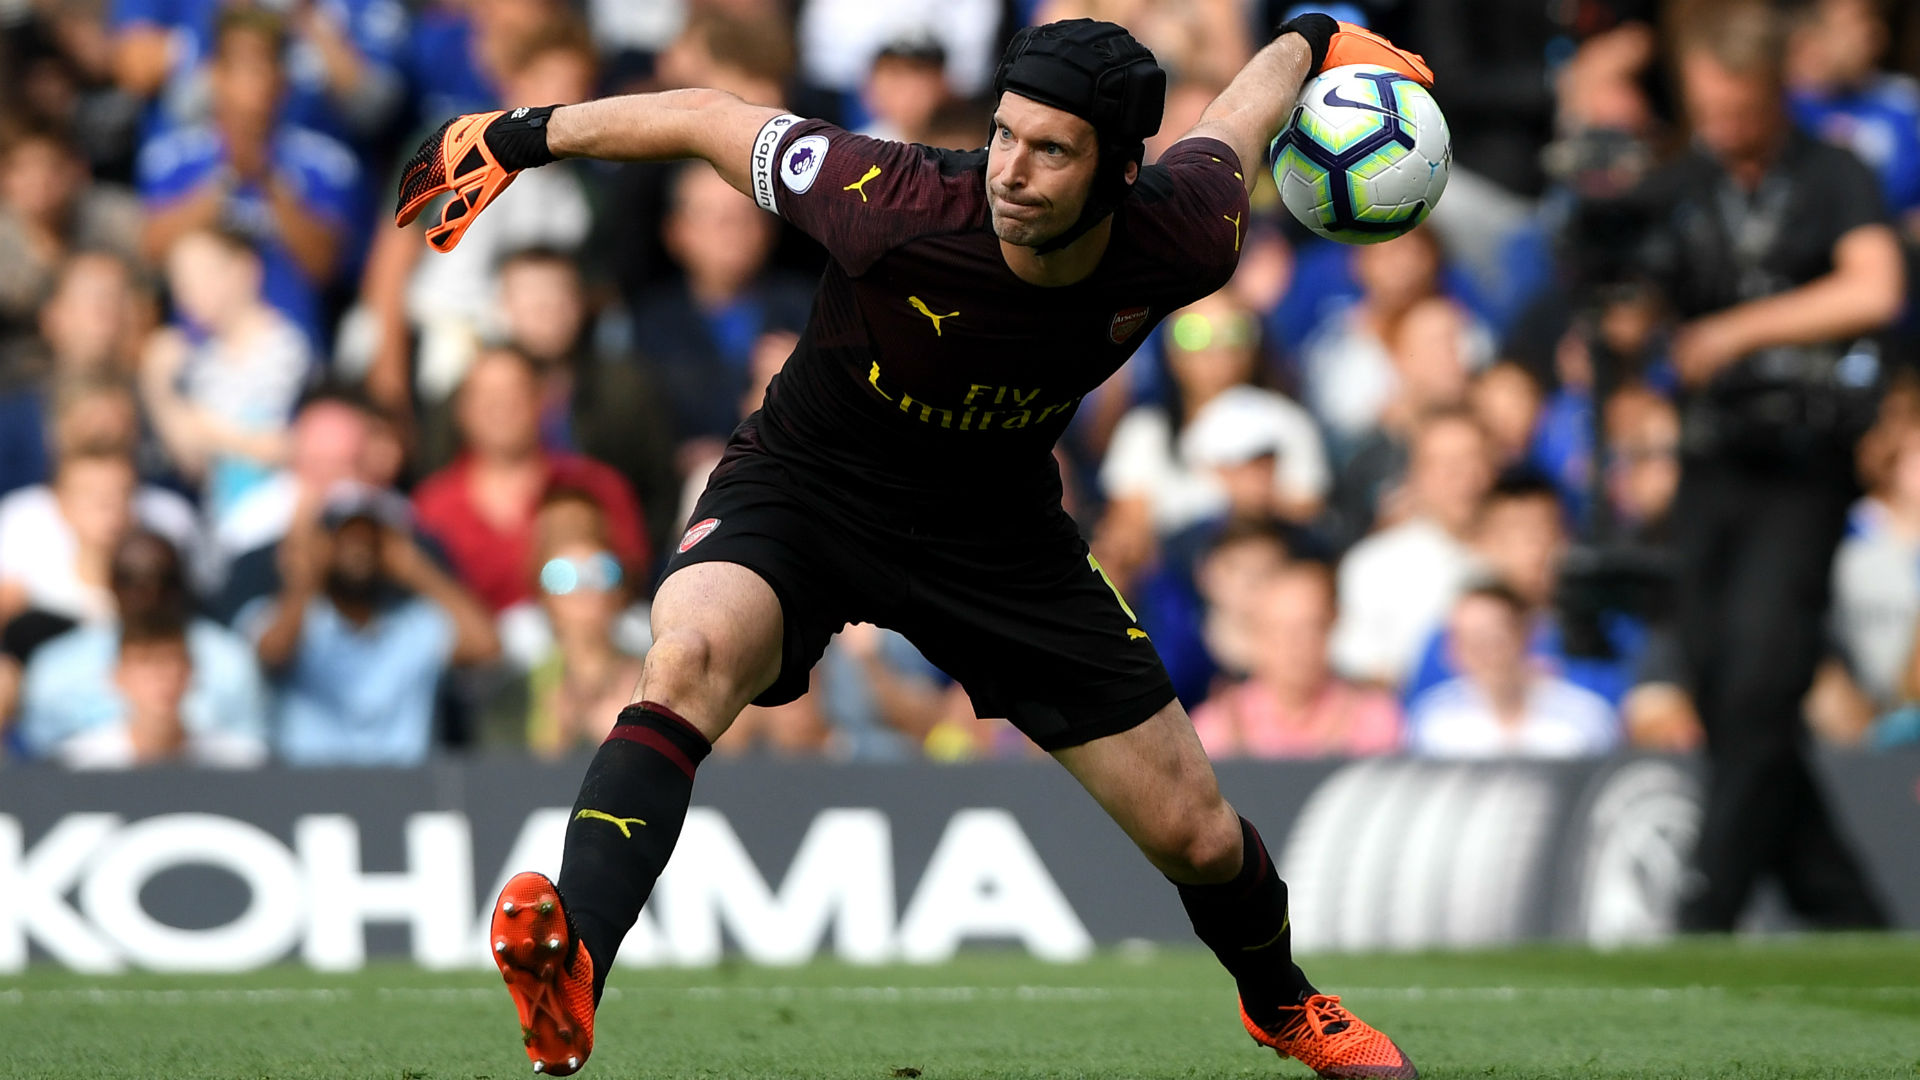 Petr Cech Announces Retirement: Arsenal Keeper's Call